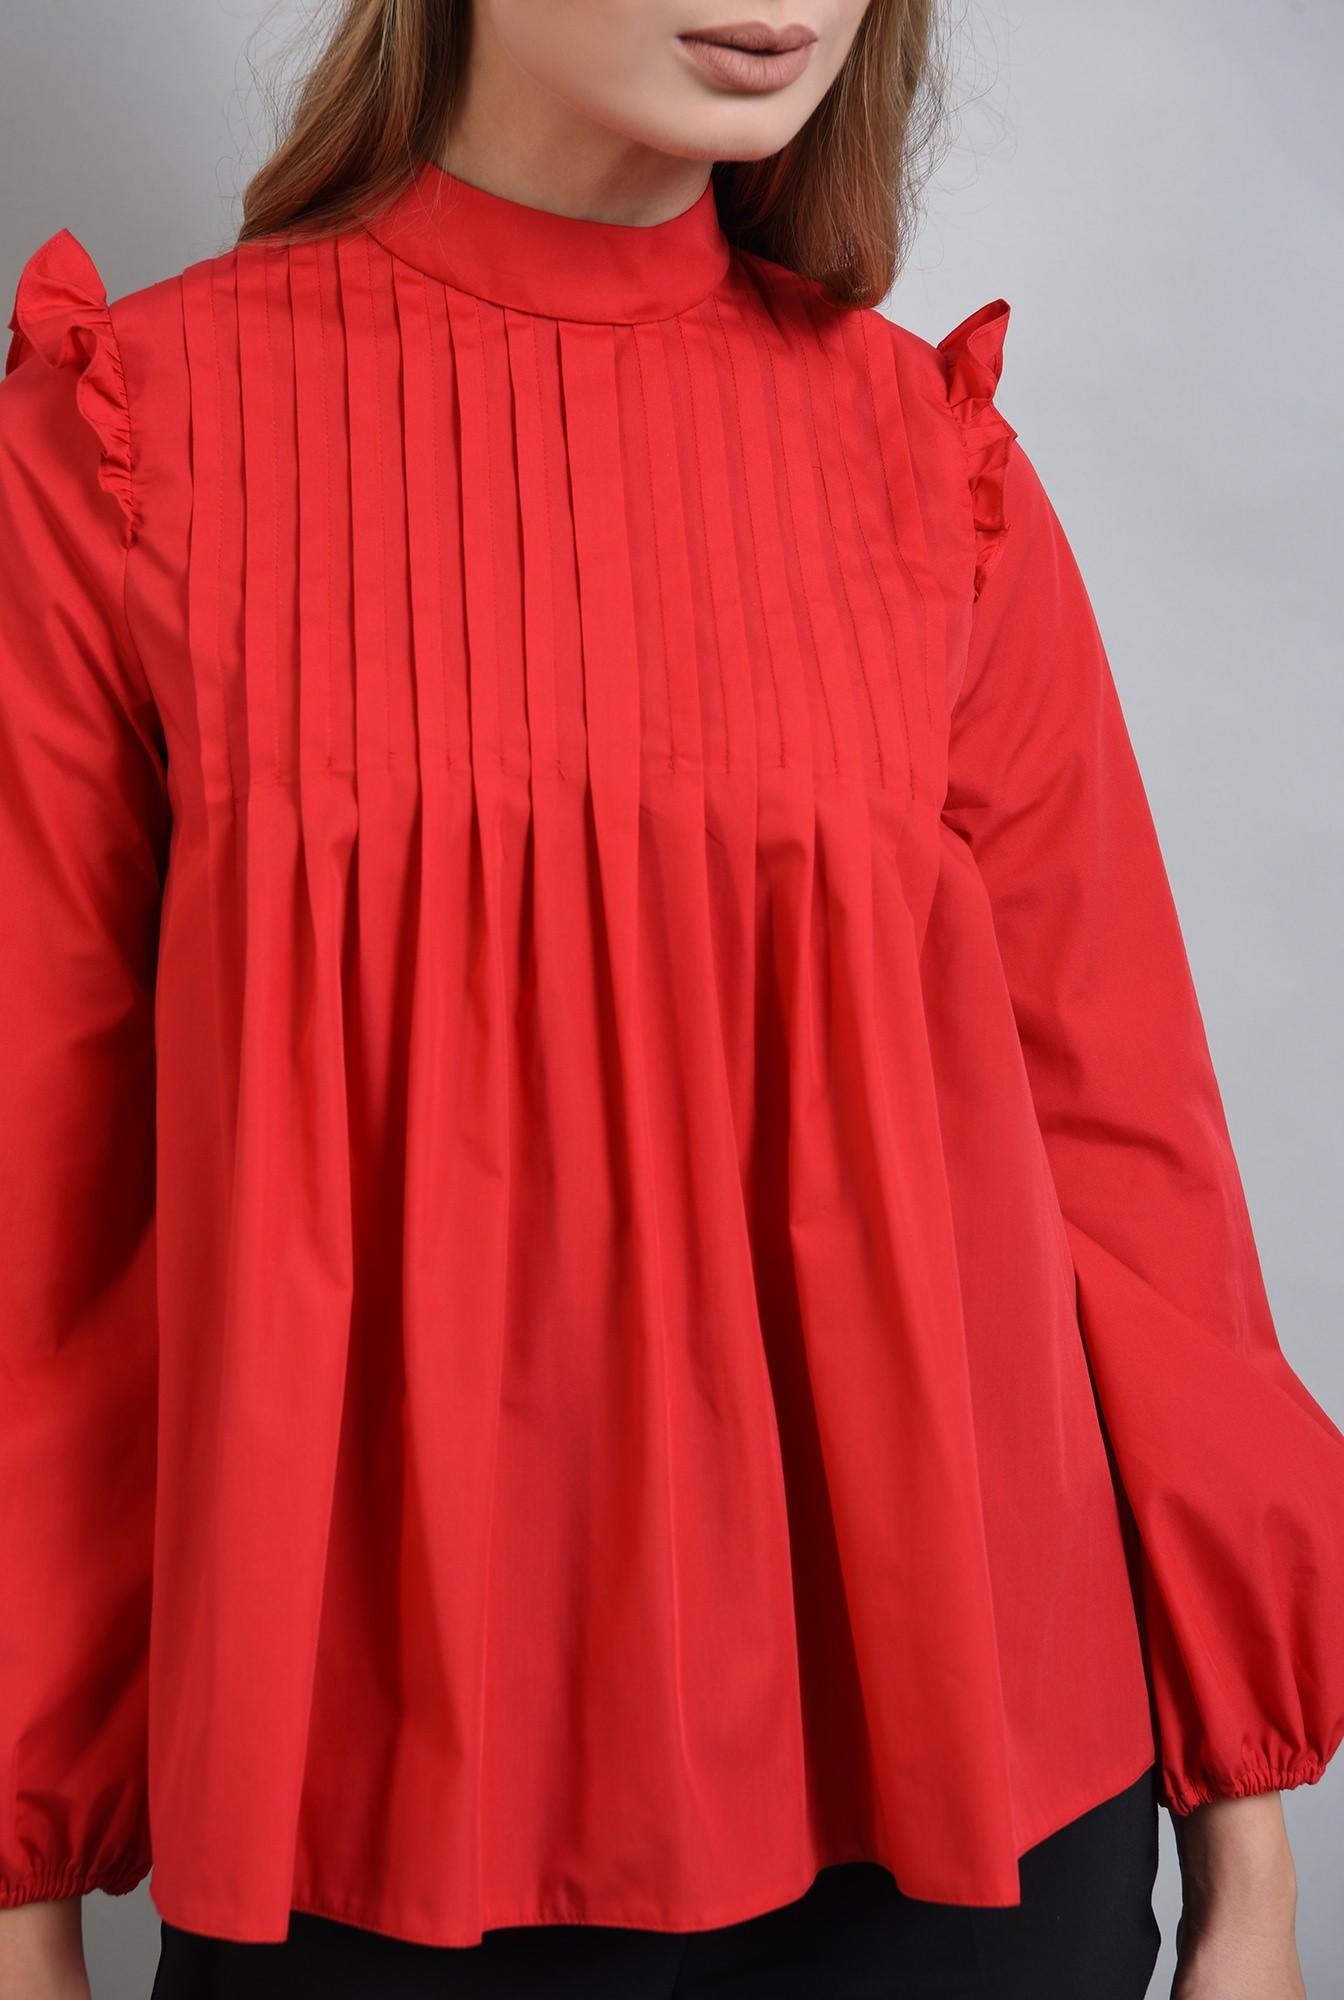 2 - 360 - bluza rosie din bumbac, cu pliuri si volan, Poema